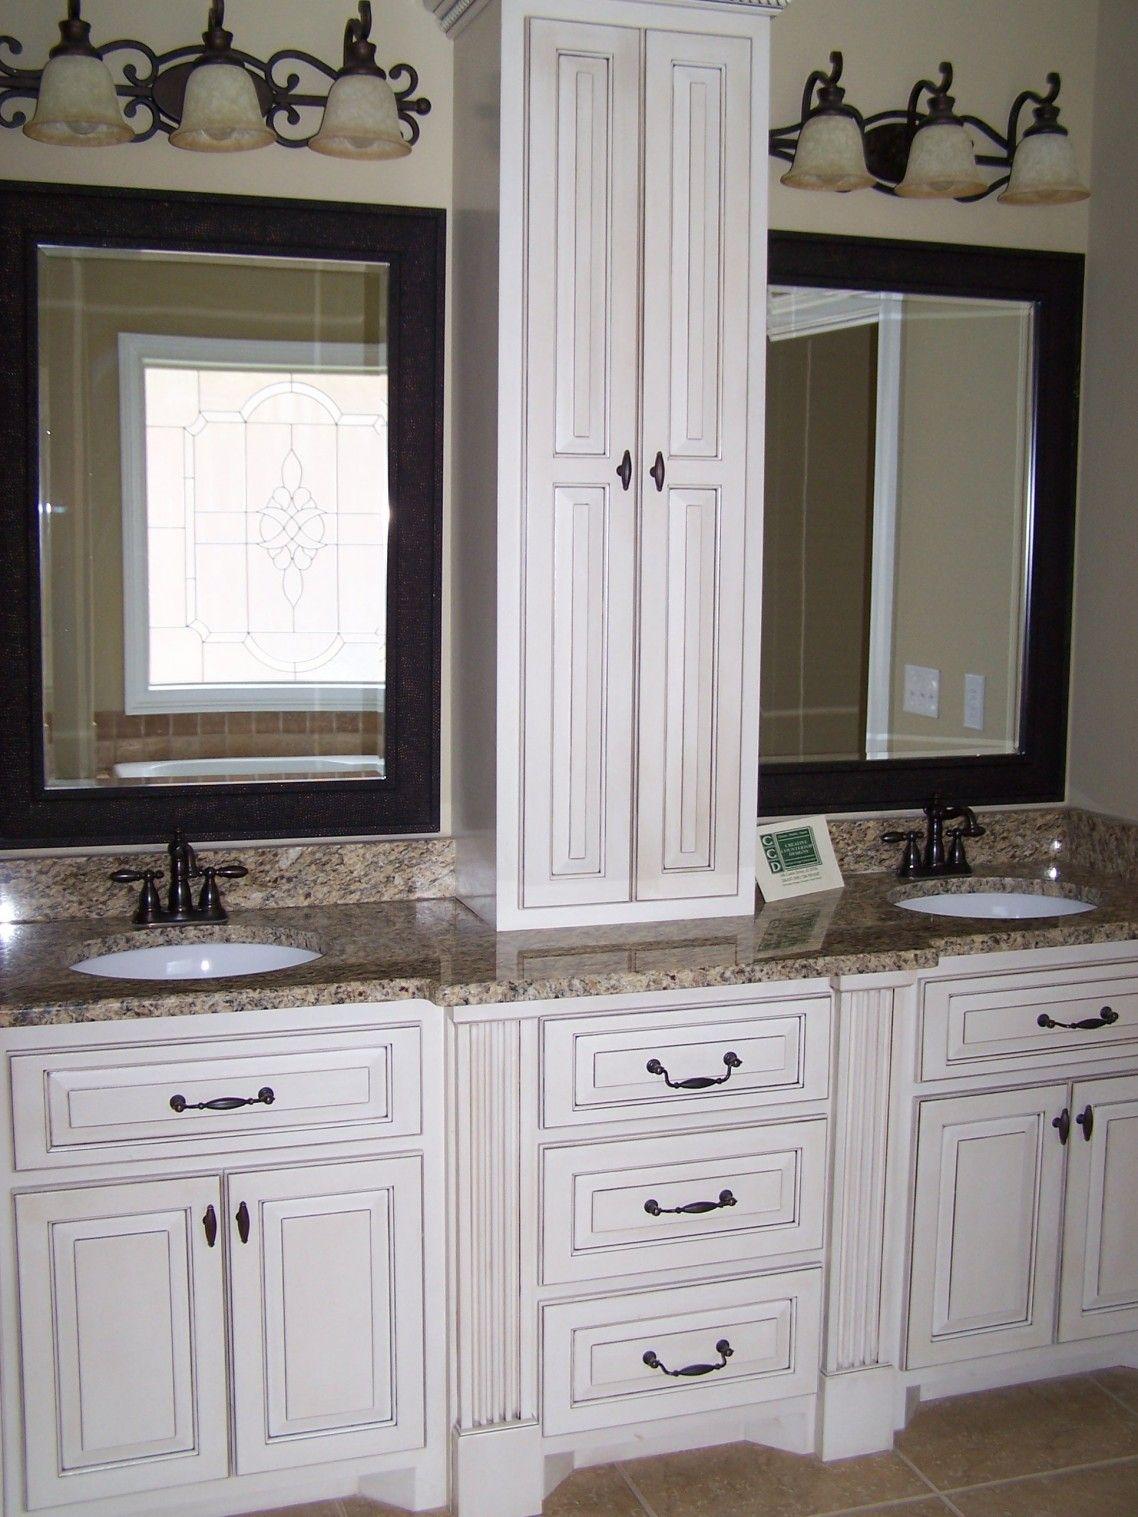 furniture-interior-bathroom-white-kitchen-cabinets-custom-bathroom ...